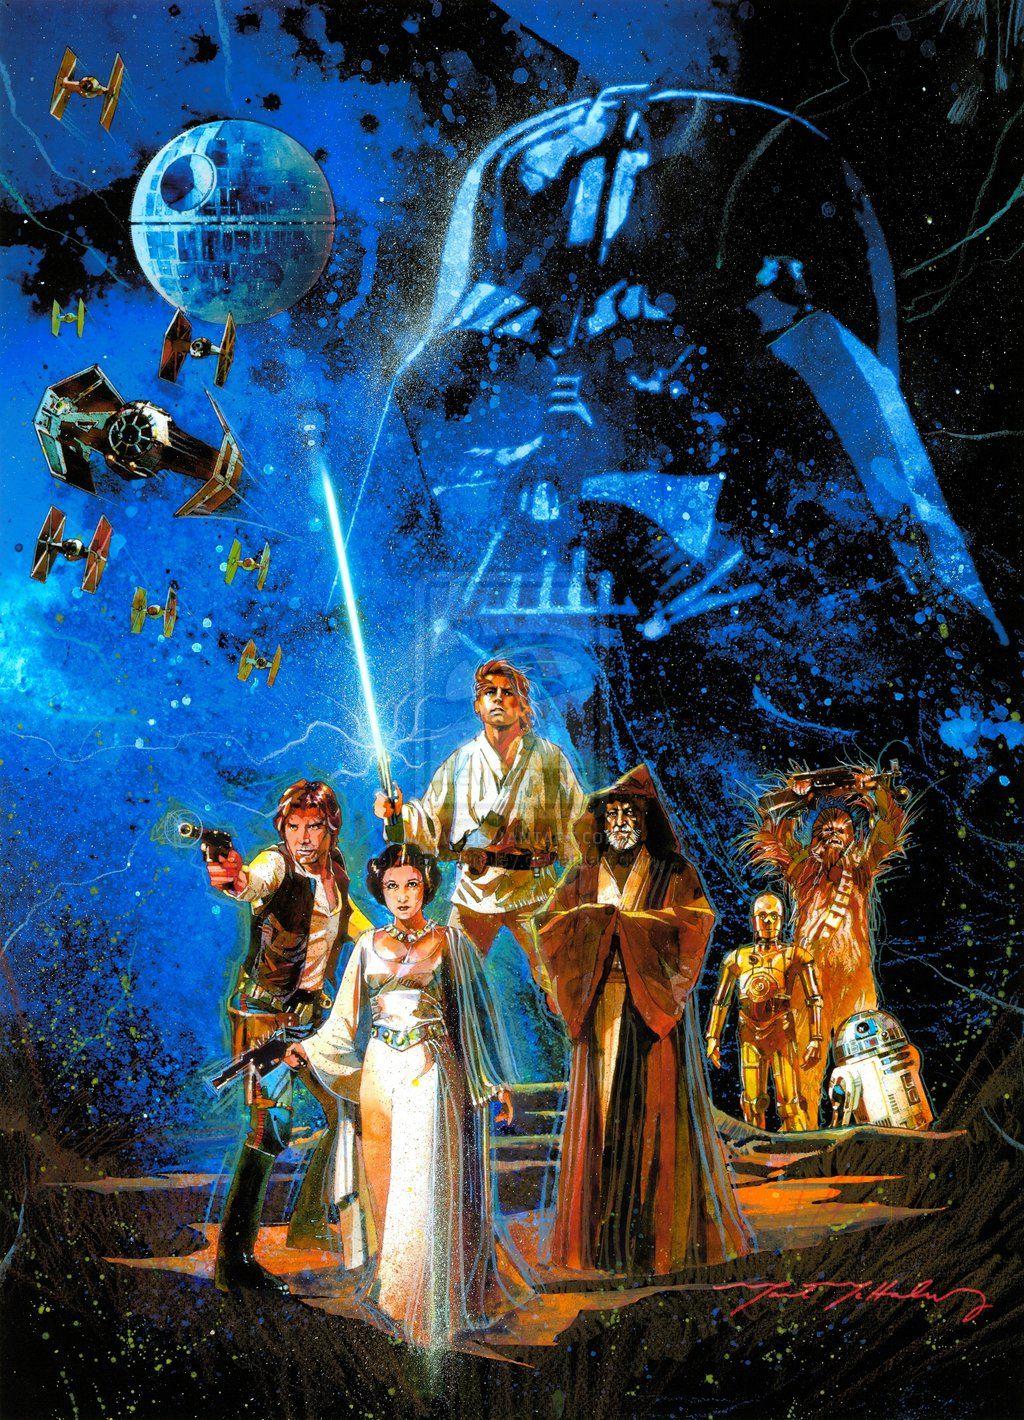 Cool Vintage Style Star Wars Poster Geektyrant Star Wars Art Star Wars Poster Star Wars Wallpaper